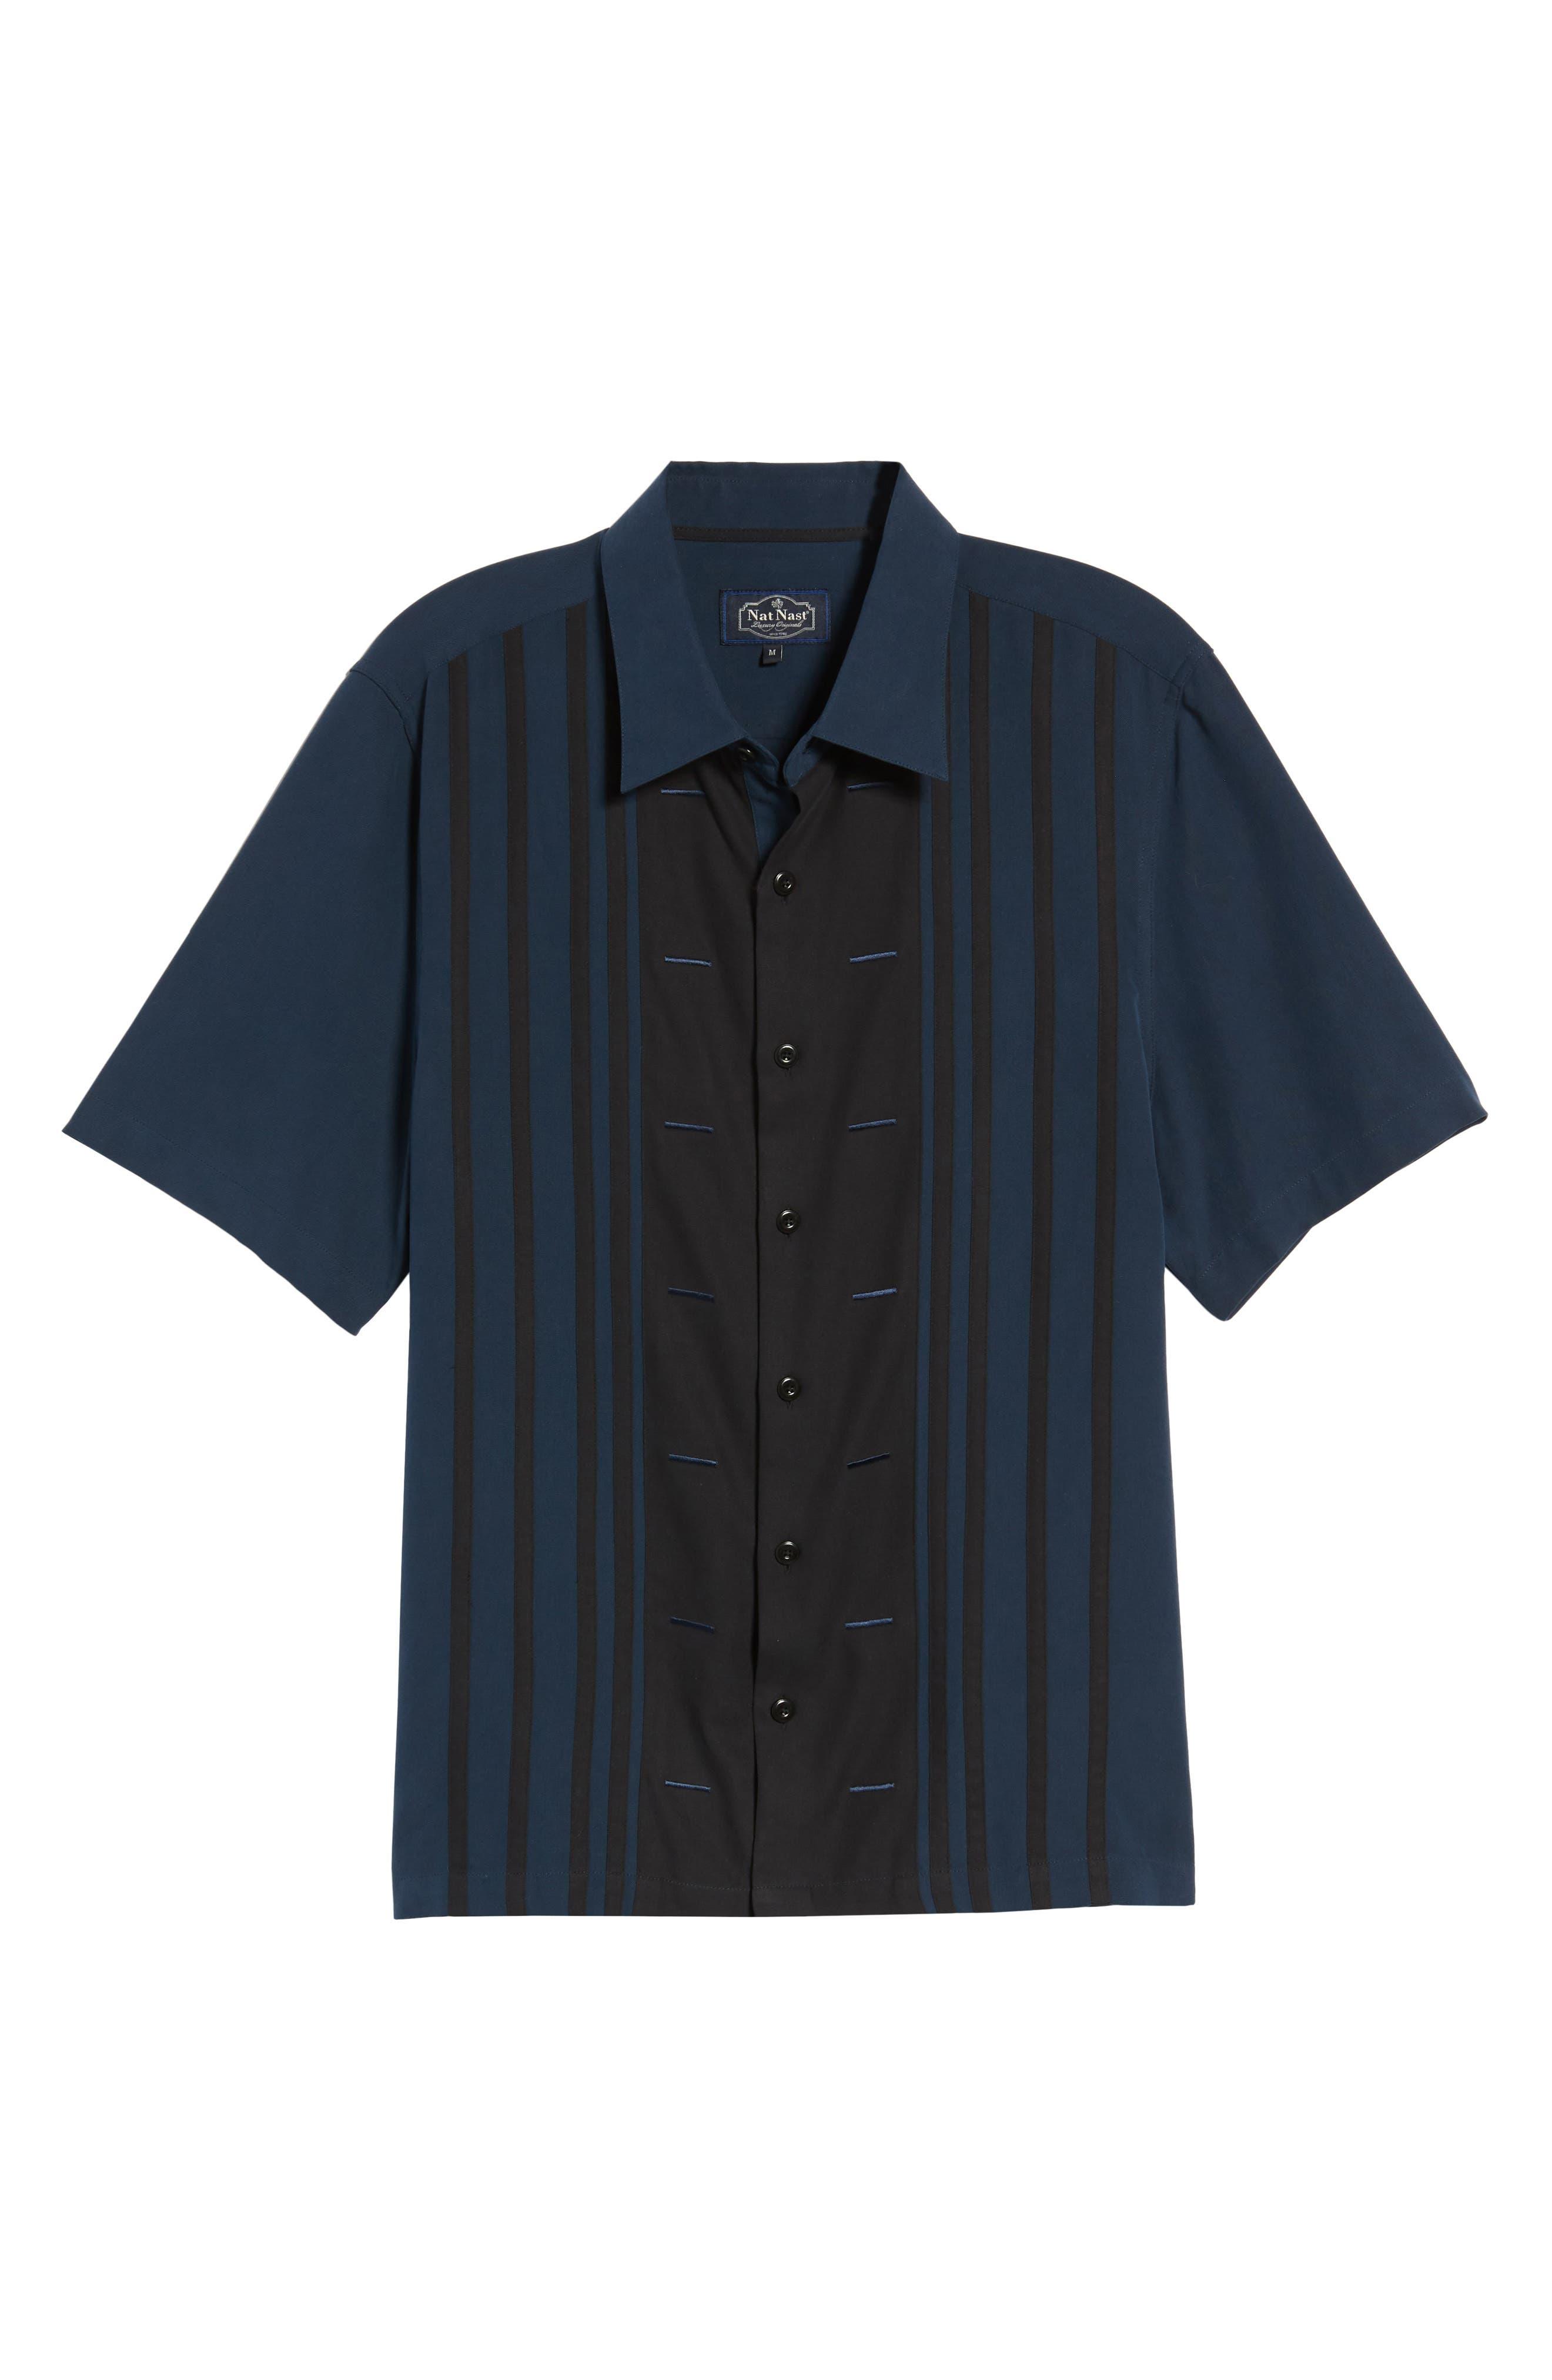 Key Best Camp Shirt,                             Alternate thumbnail 6, color,                             Midnight